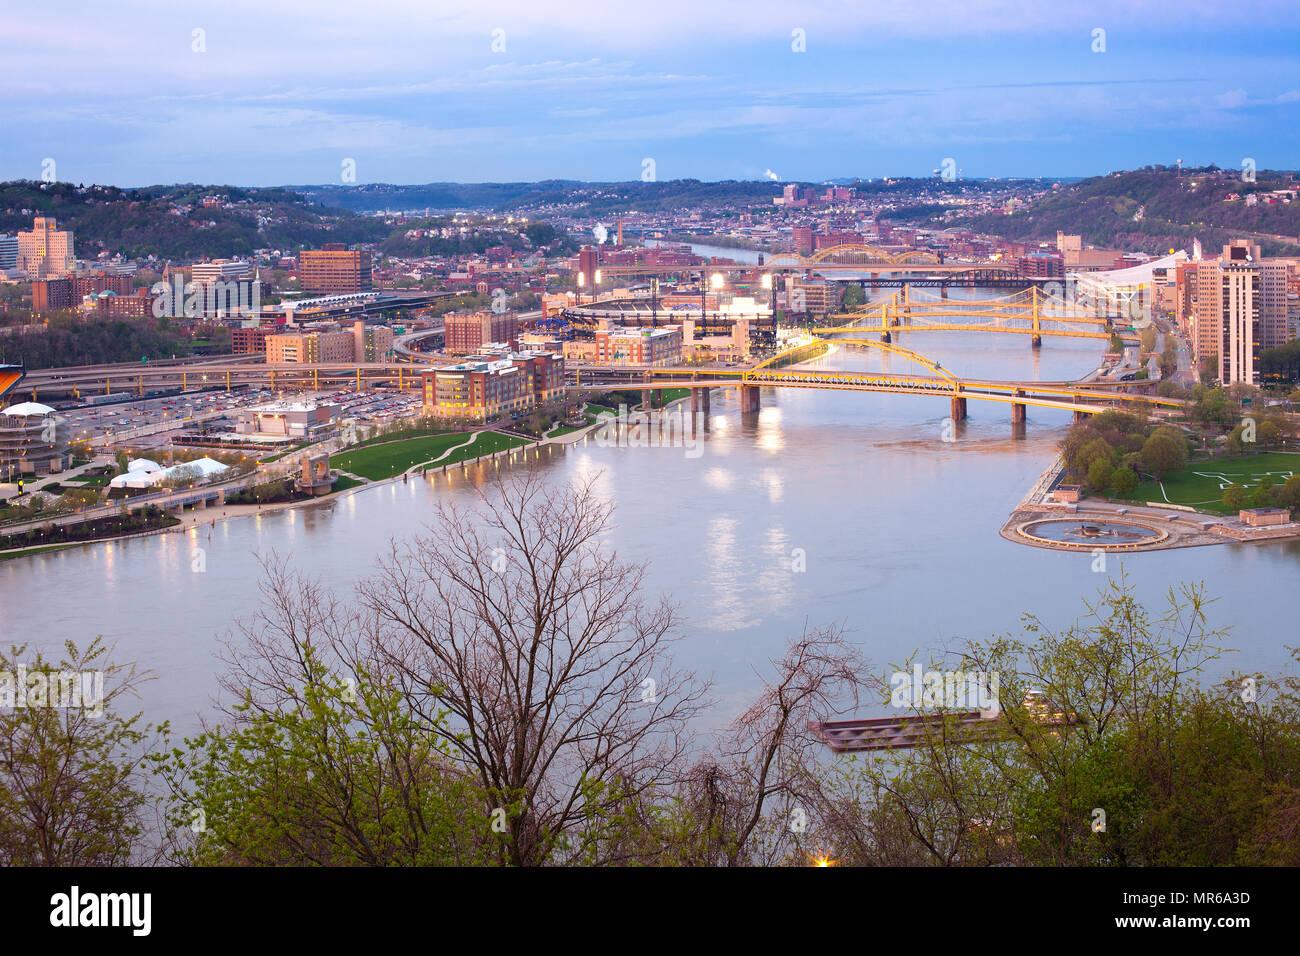 Allegheny River Bridge Pittsburgh Stock Photos & Allegheny